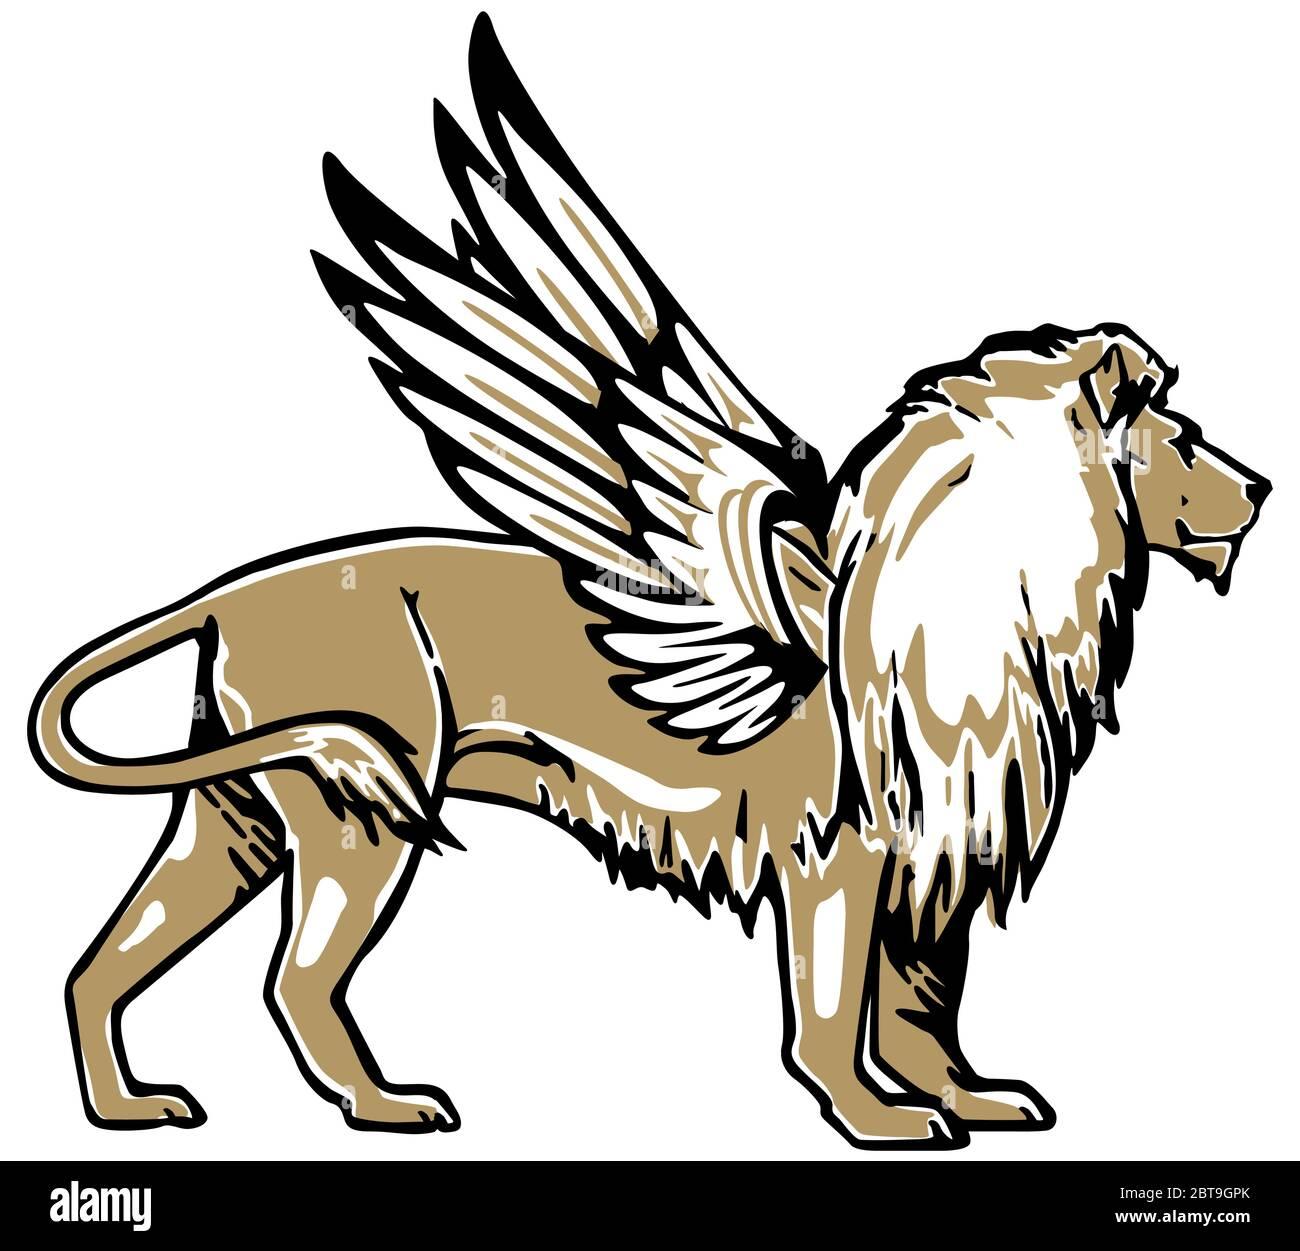 Ulle Winged Lion Clip Art at Clker.com - vector clip art online, royalty  free & public domain